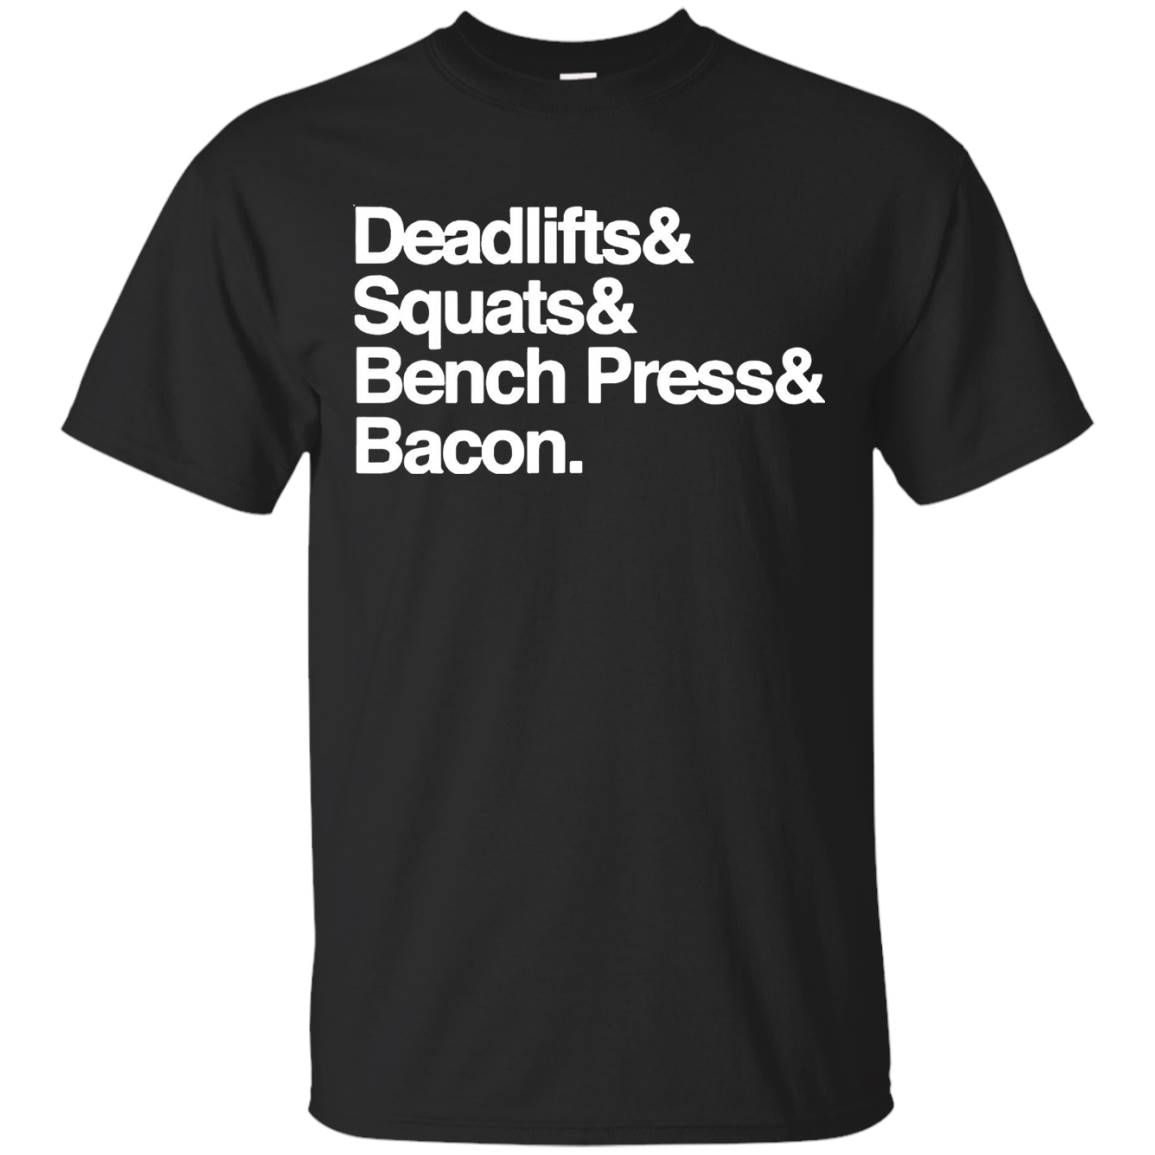 Deadlifts Squats Bench Press Bacon Tee shirt